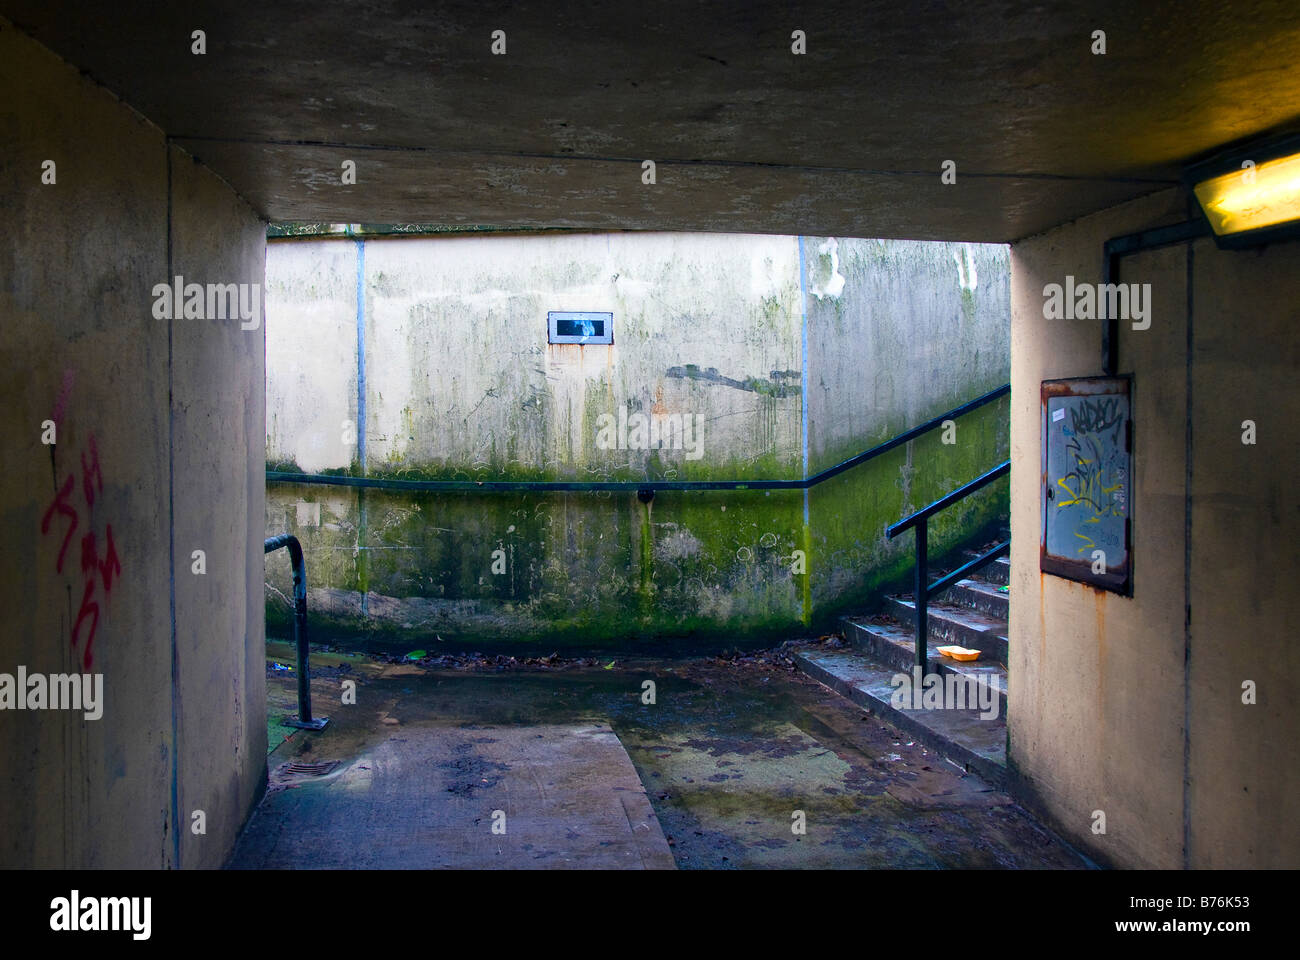 Public Underpass in Oldham, Lancashire England. - Stock Image